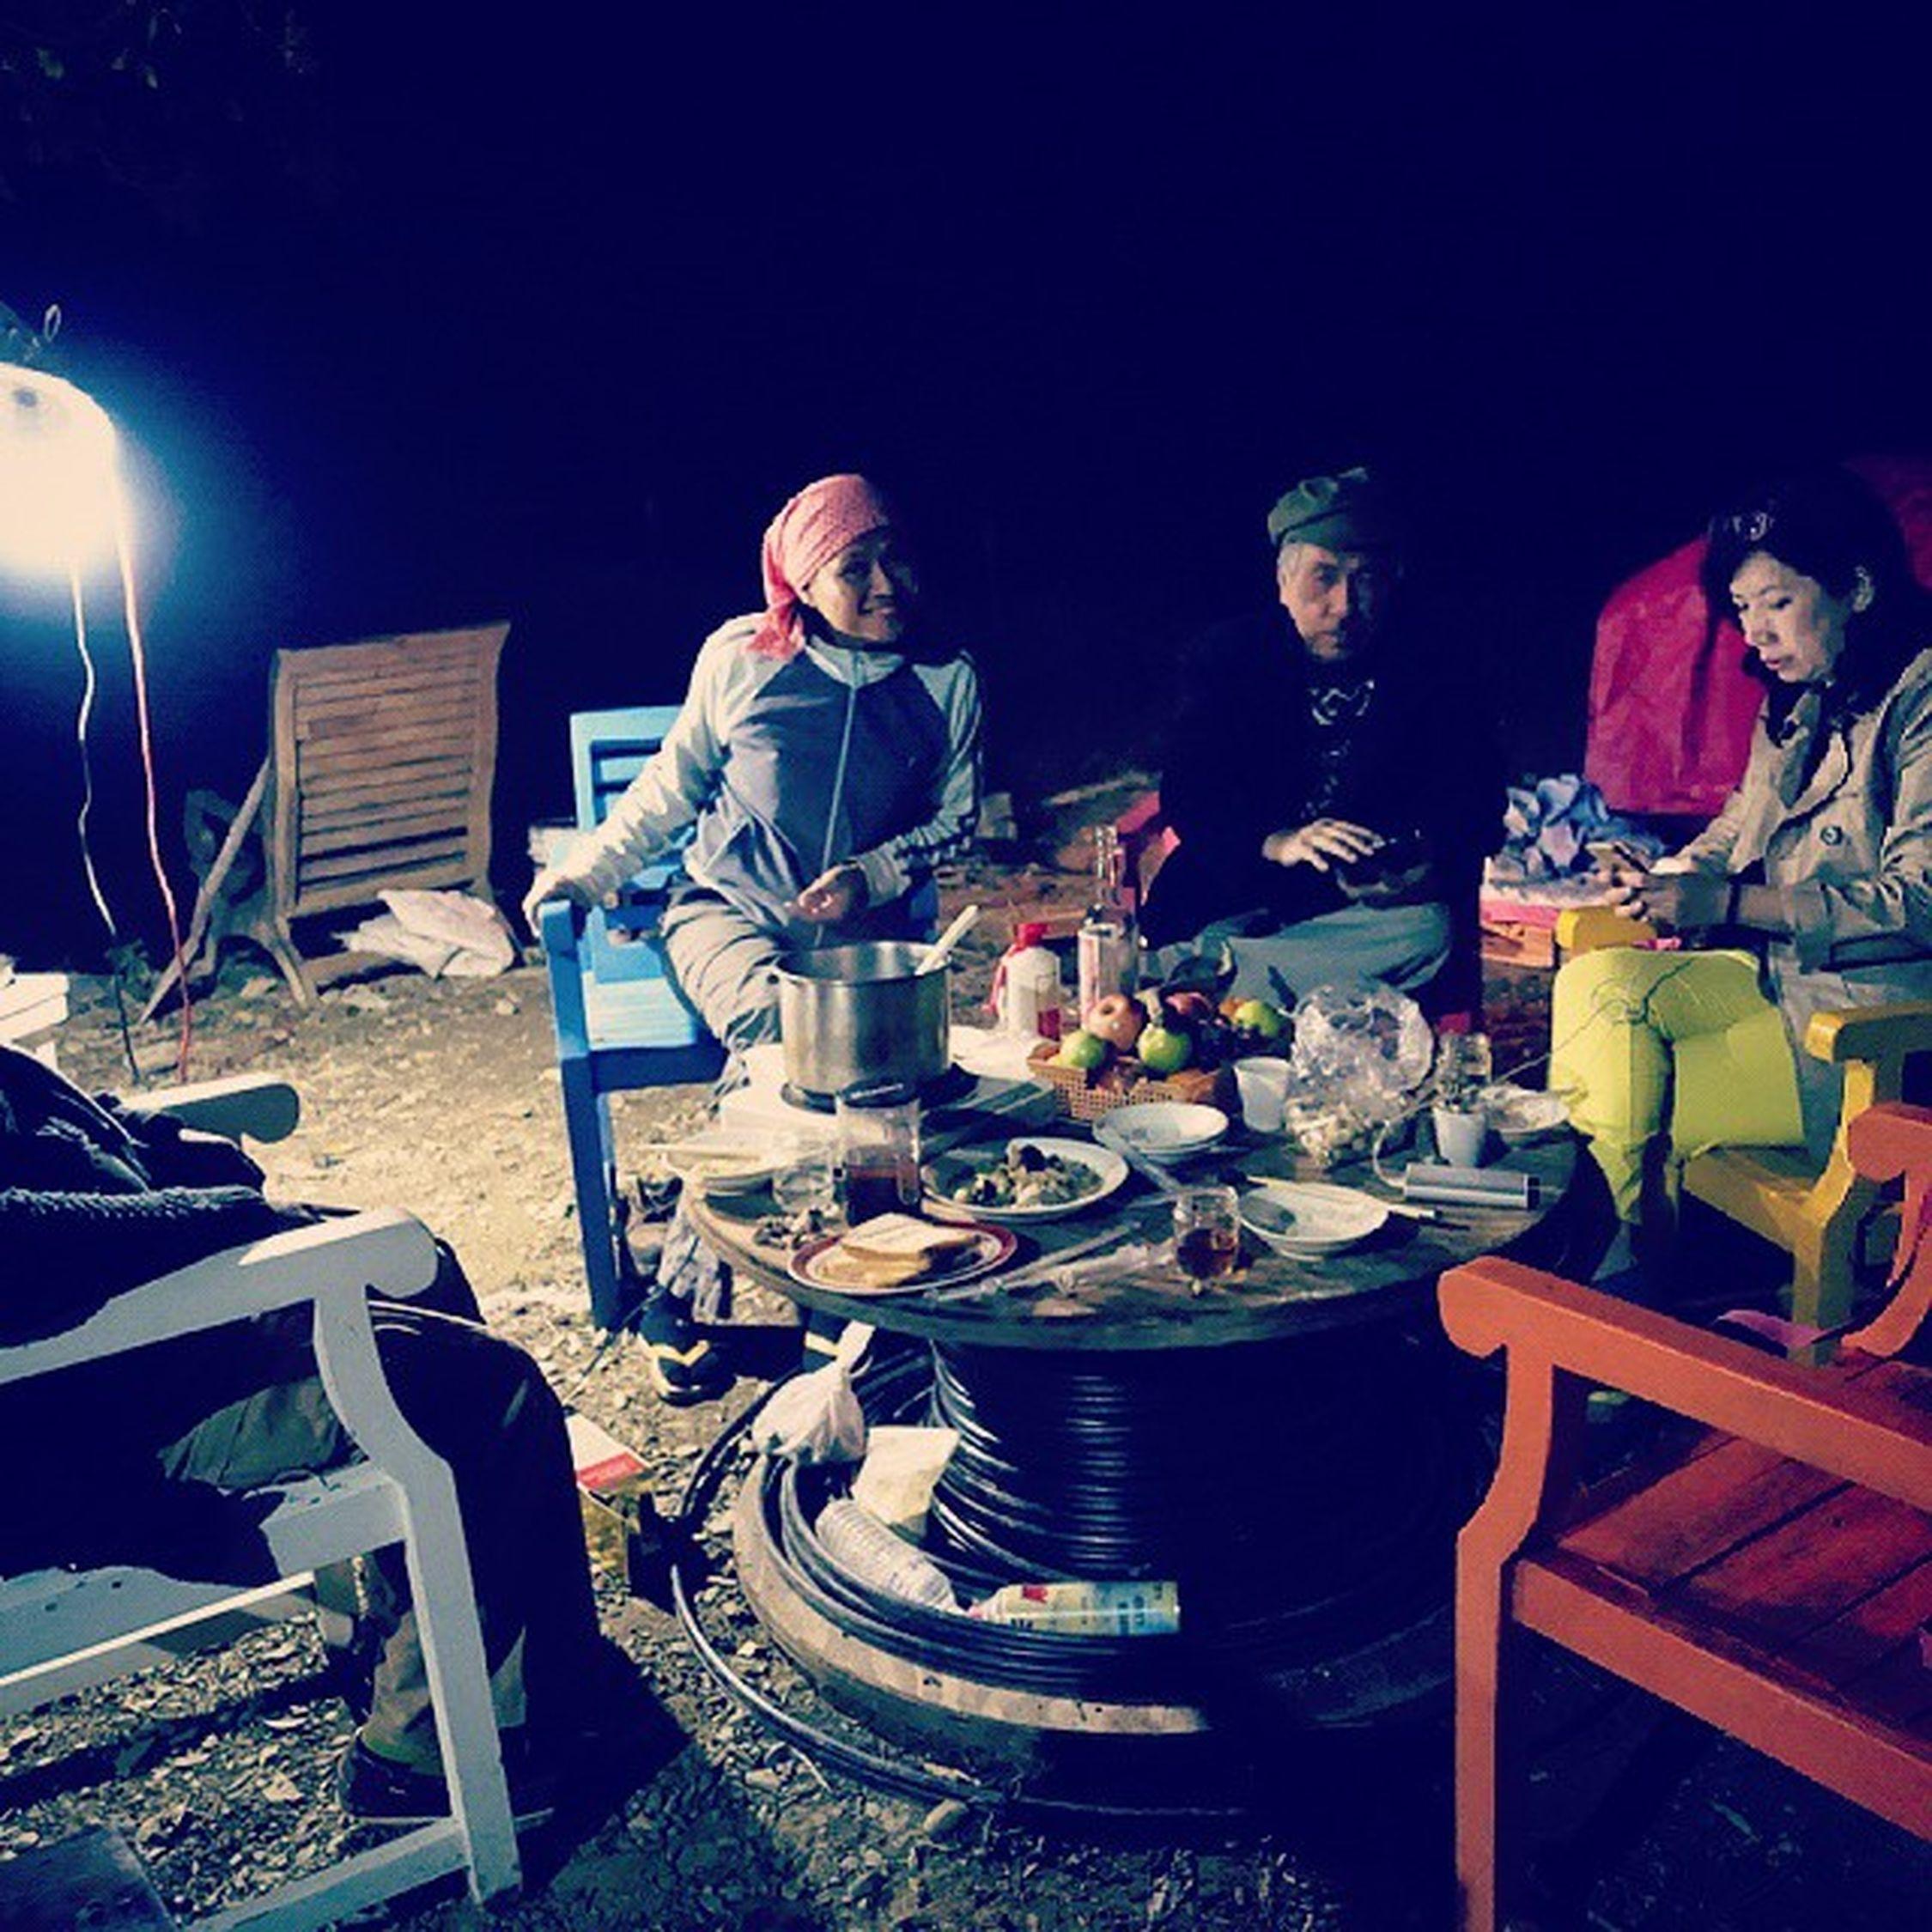 跟著珮貞姐體驗原住民,覺得新鮮 Aboriginal Night Talking Pictures Warm